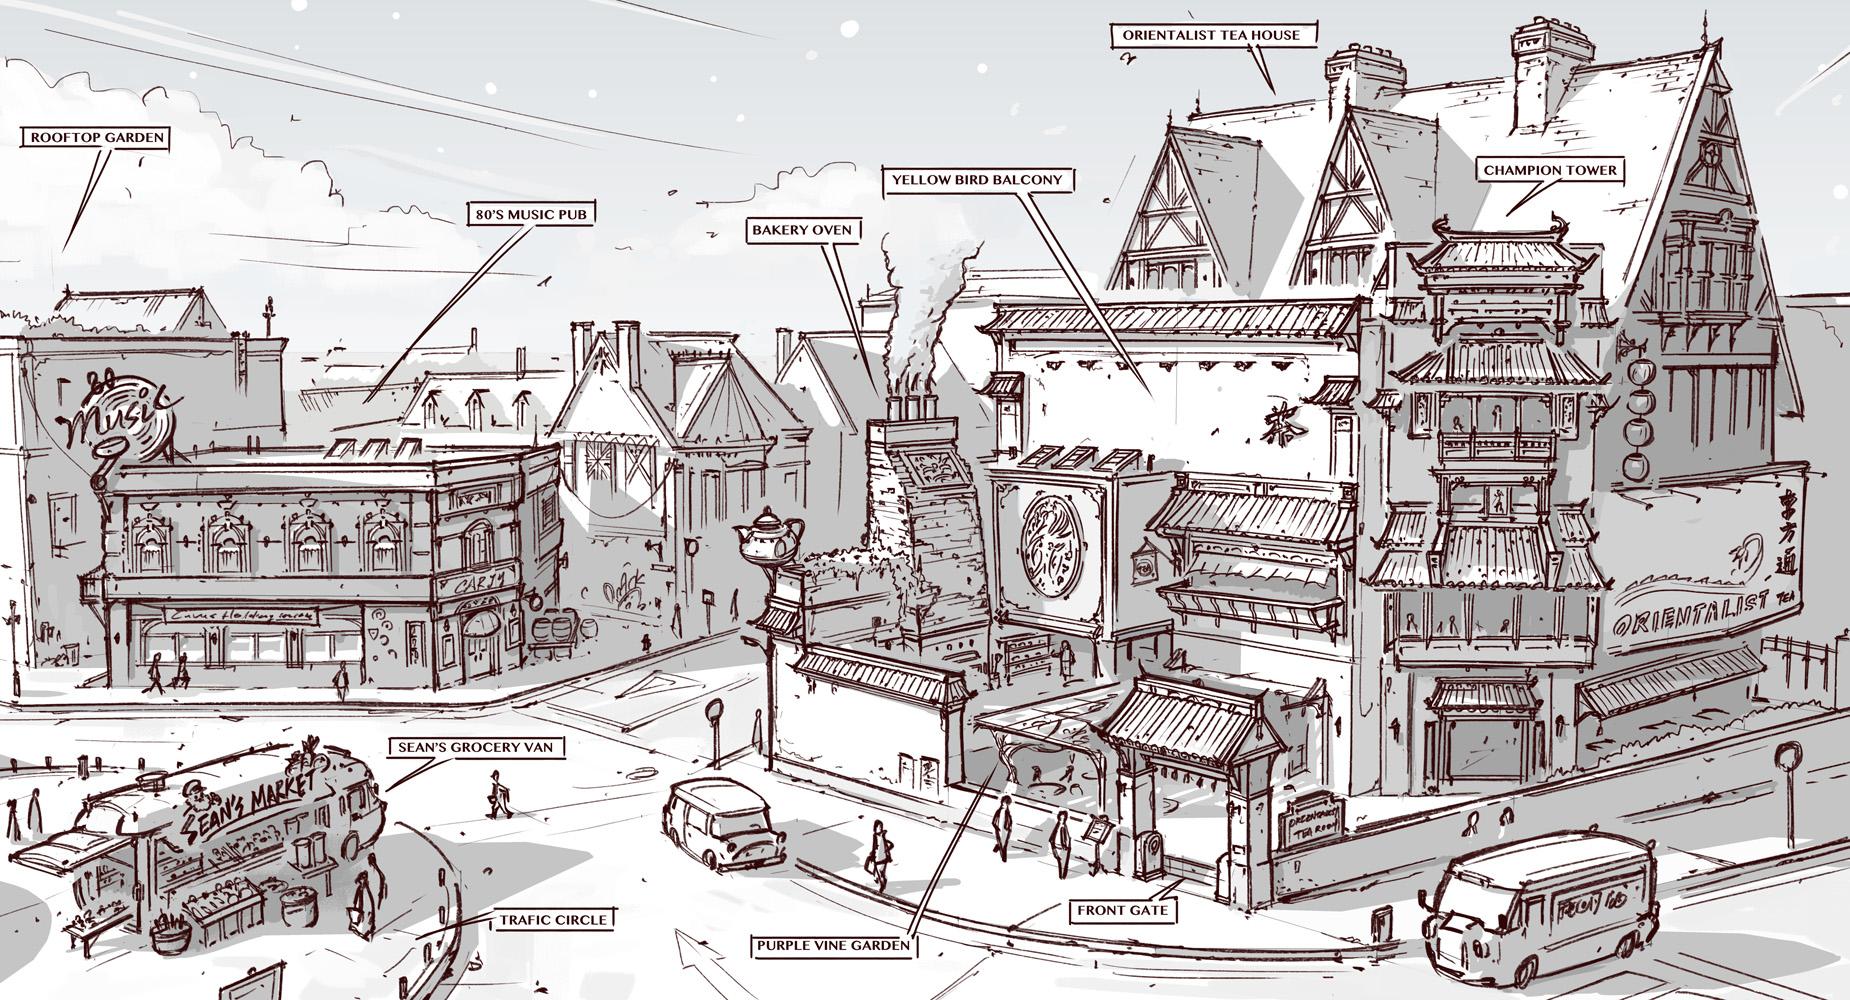 Town Design - Tearoom, music pub and vending van by alantsuei